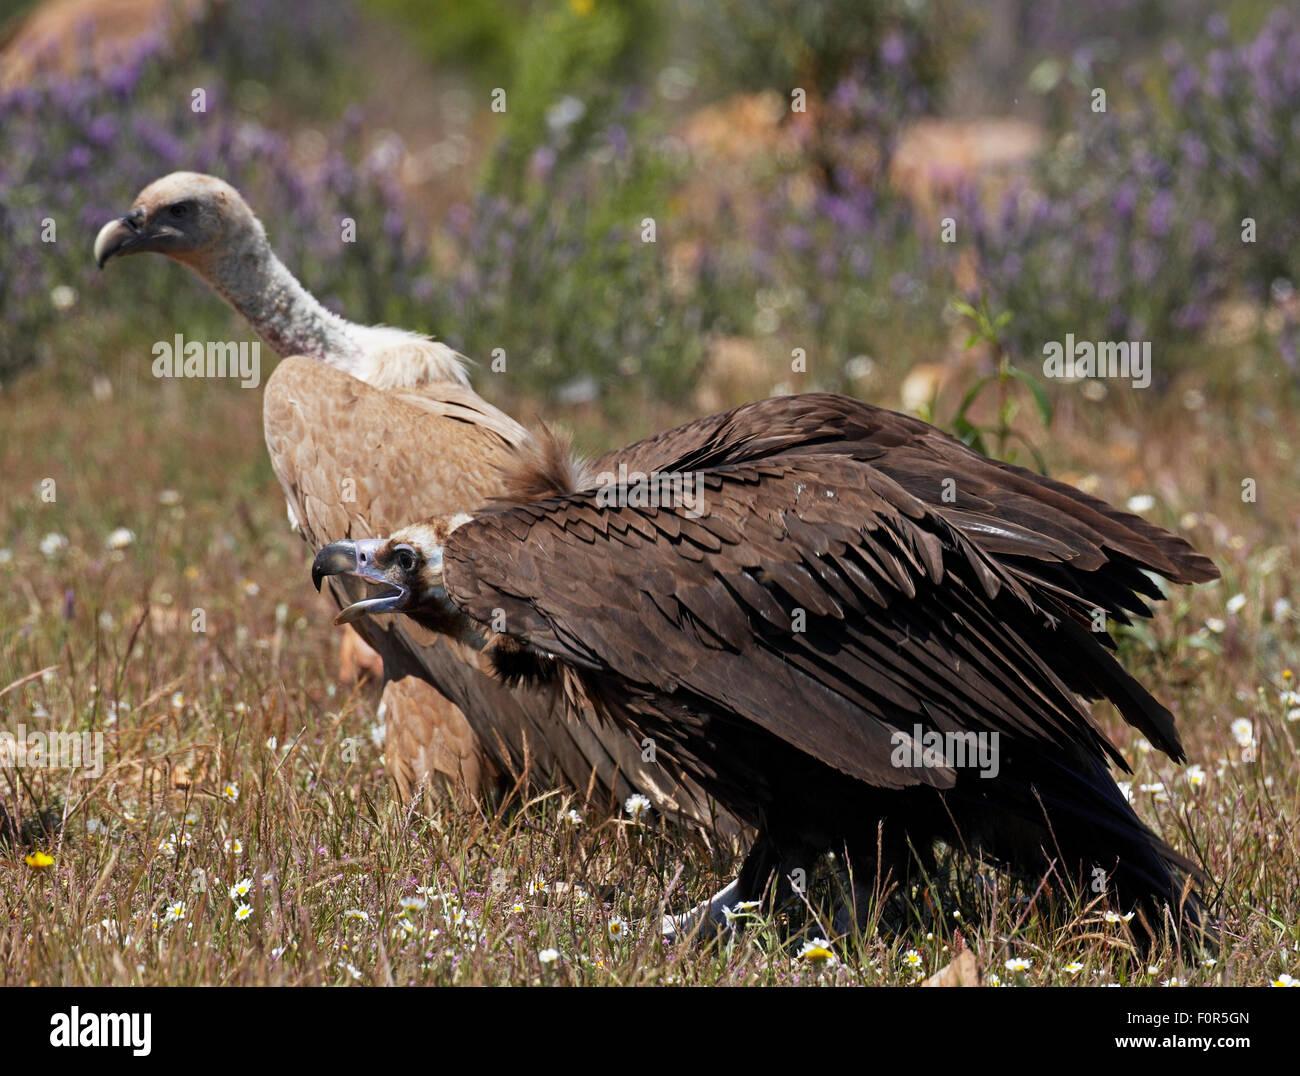 European black vulture (Aegyptus monacha) calling near a Griffon vulture (Gyps fulvus) Extremadura, Spain, April - Stock Image